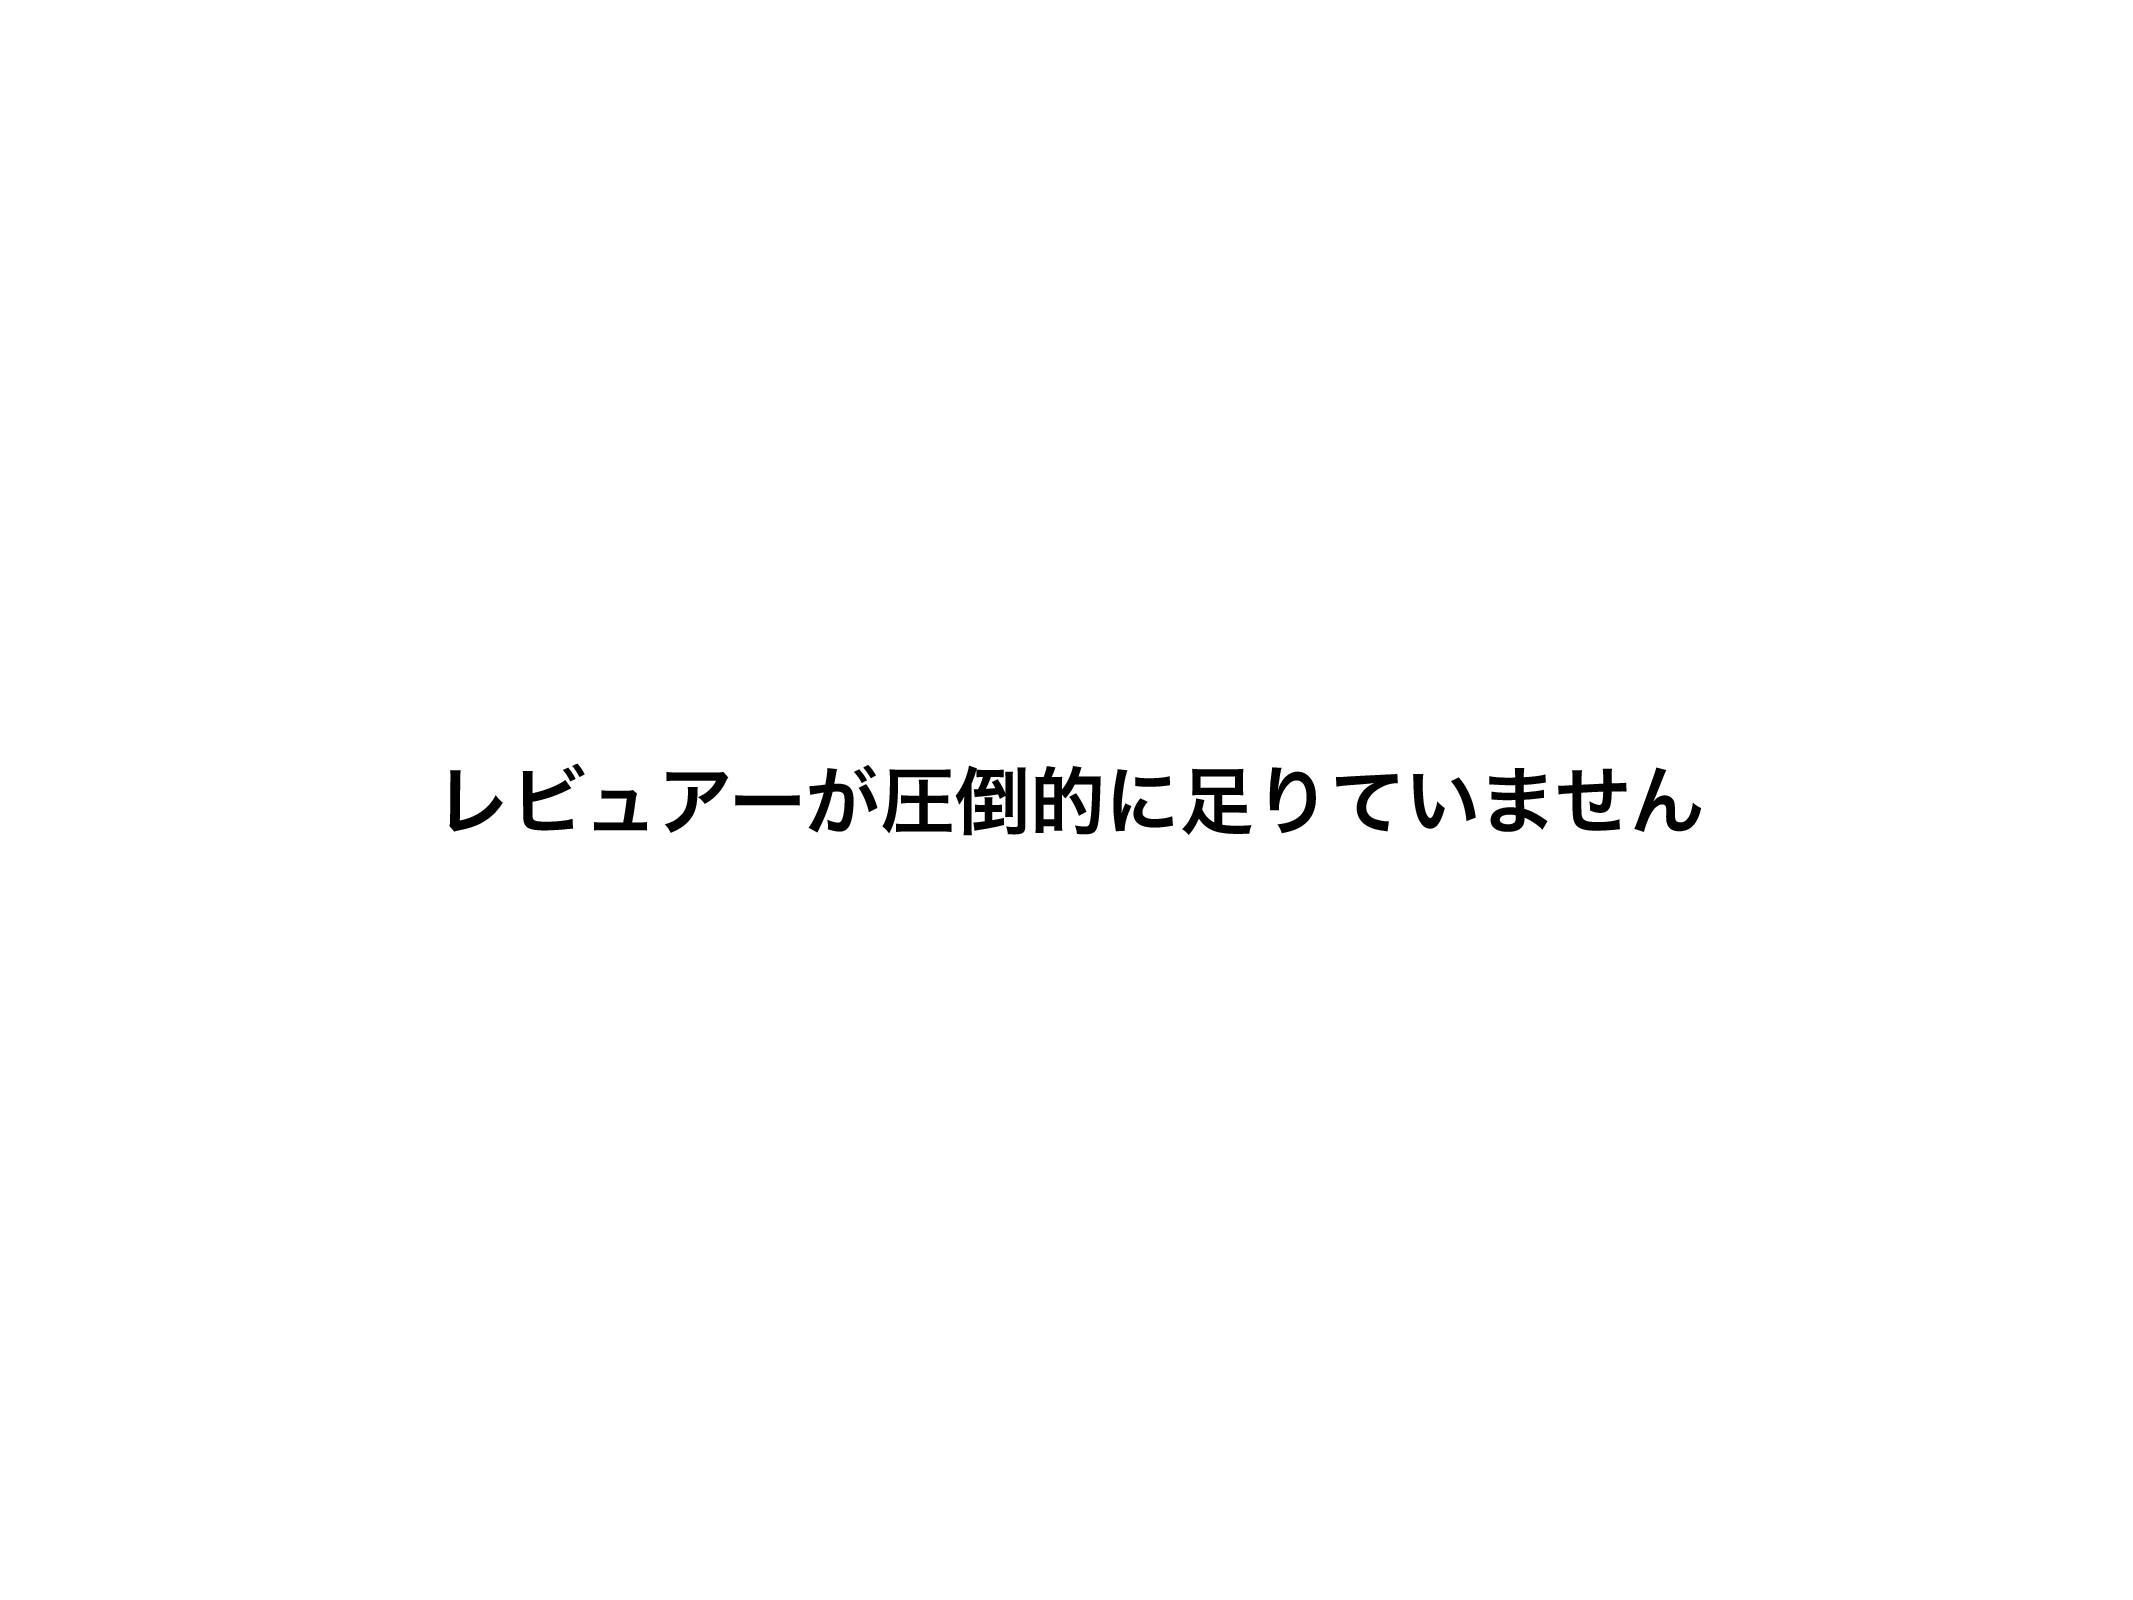 ϨϏϡΞʔ͕ѹతʹΓ͍ͯ·ͤΜ